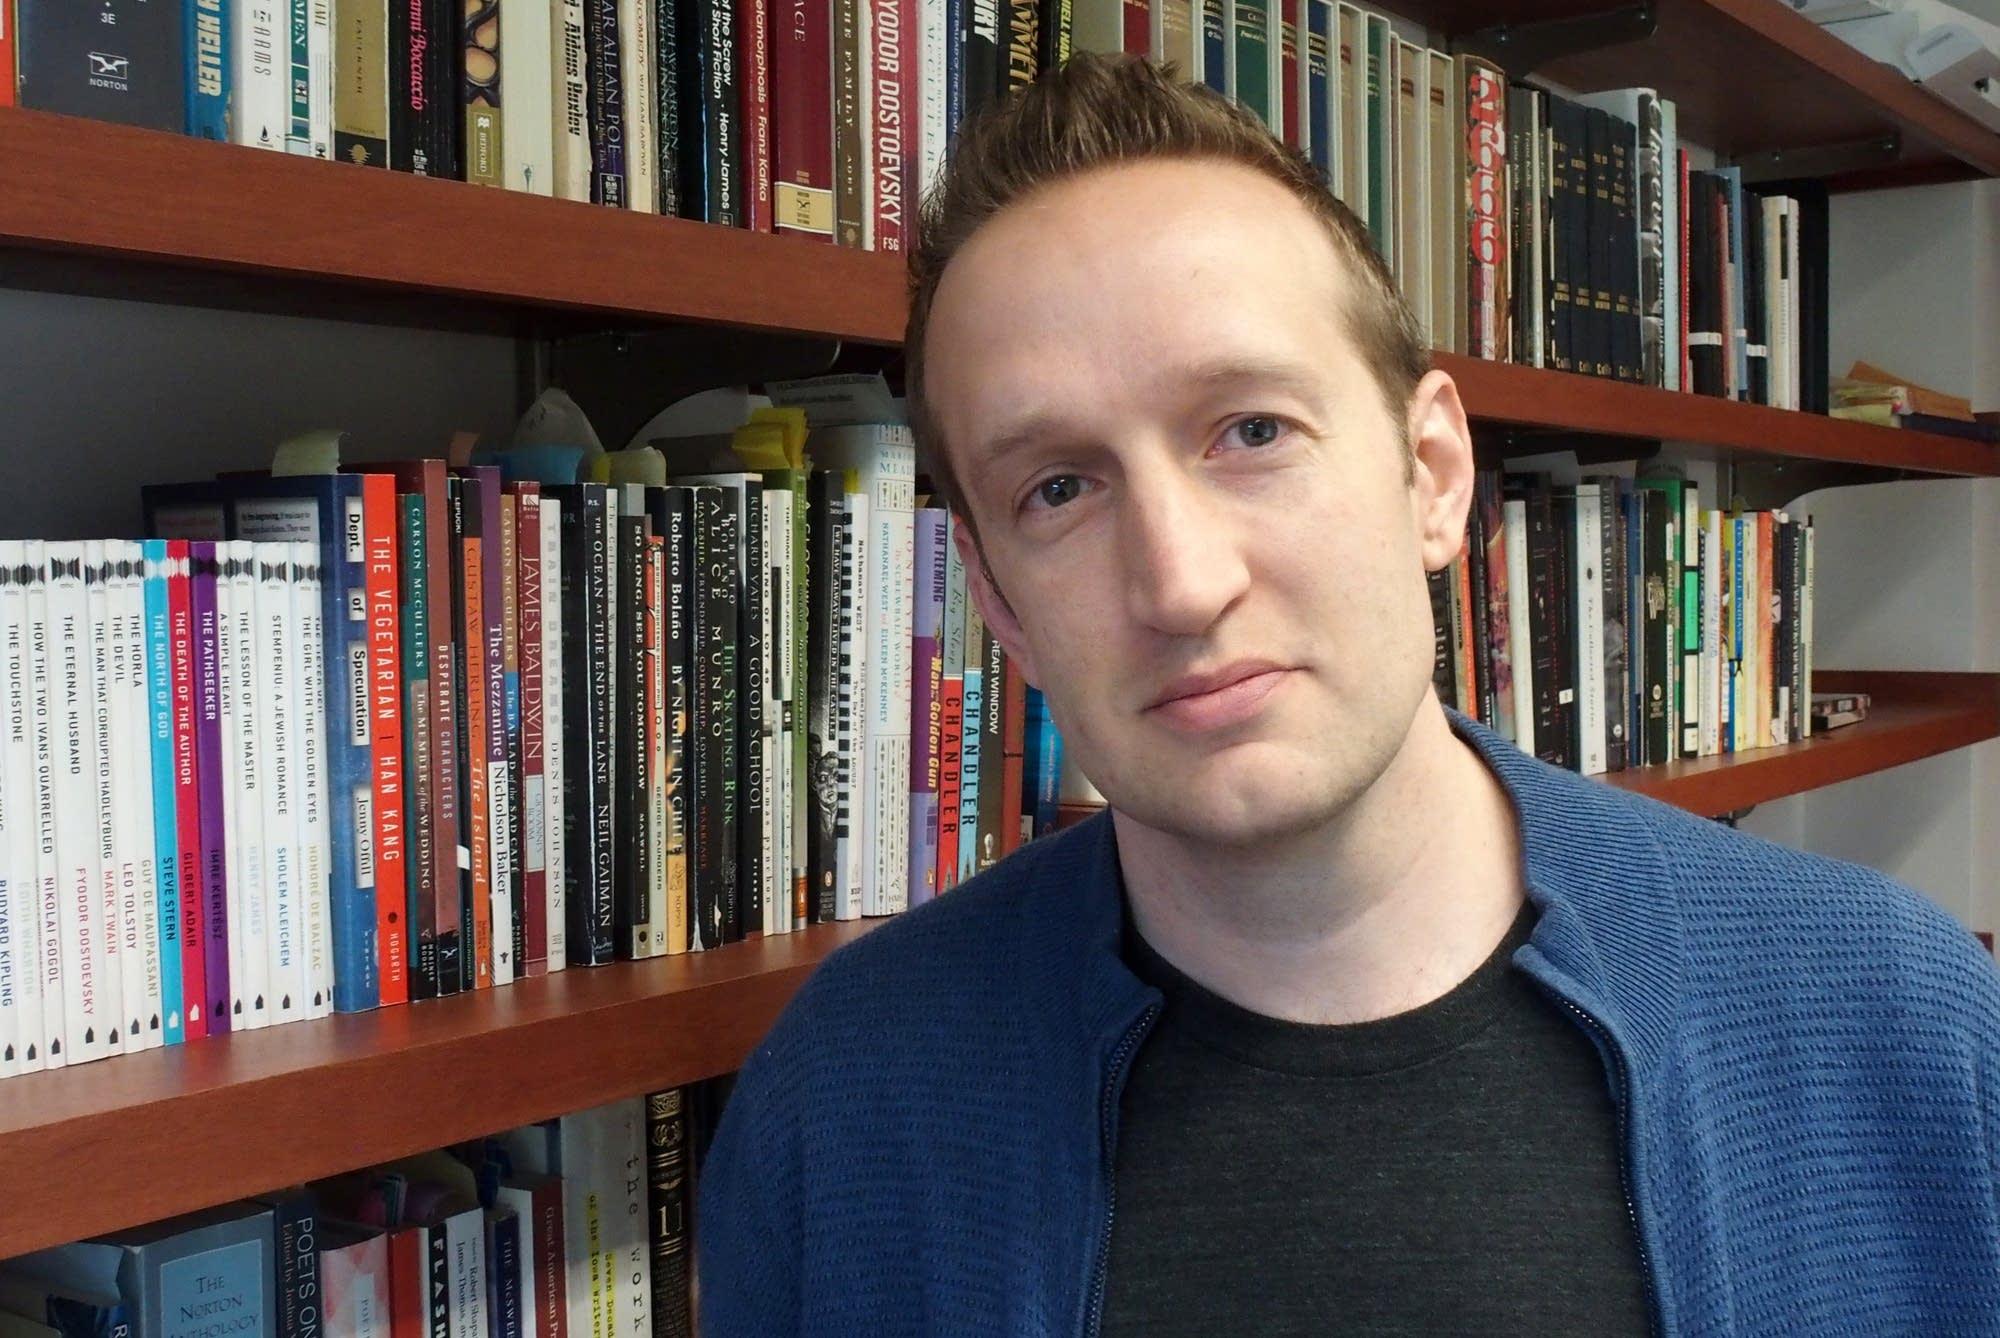 Macalester College professor Peter Bognanni